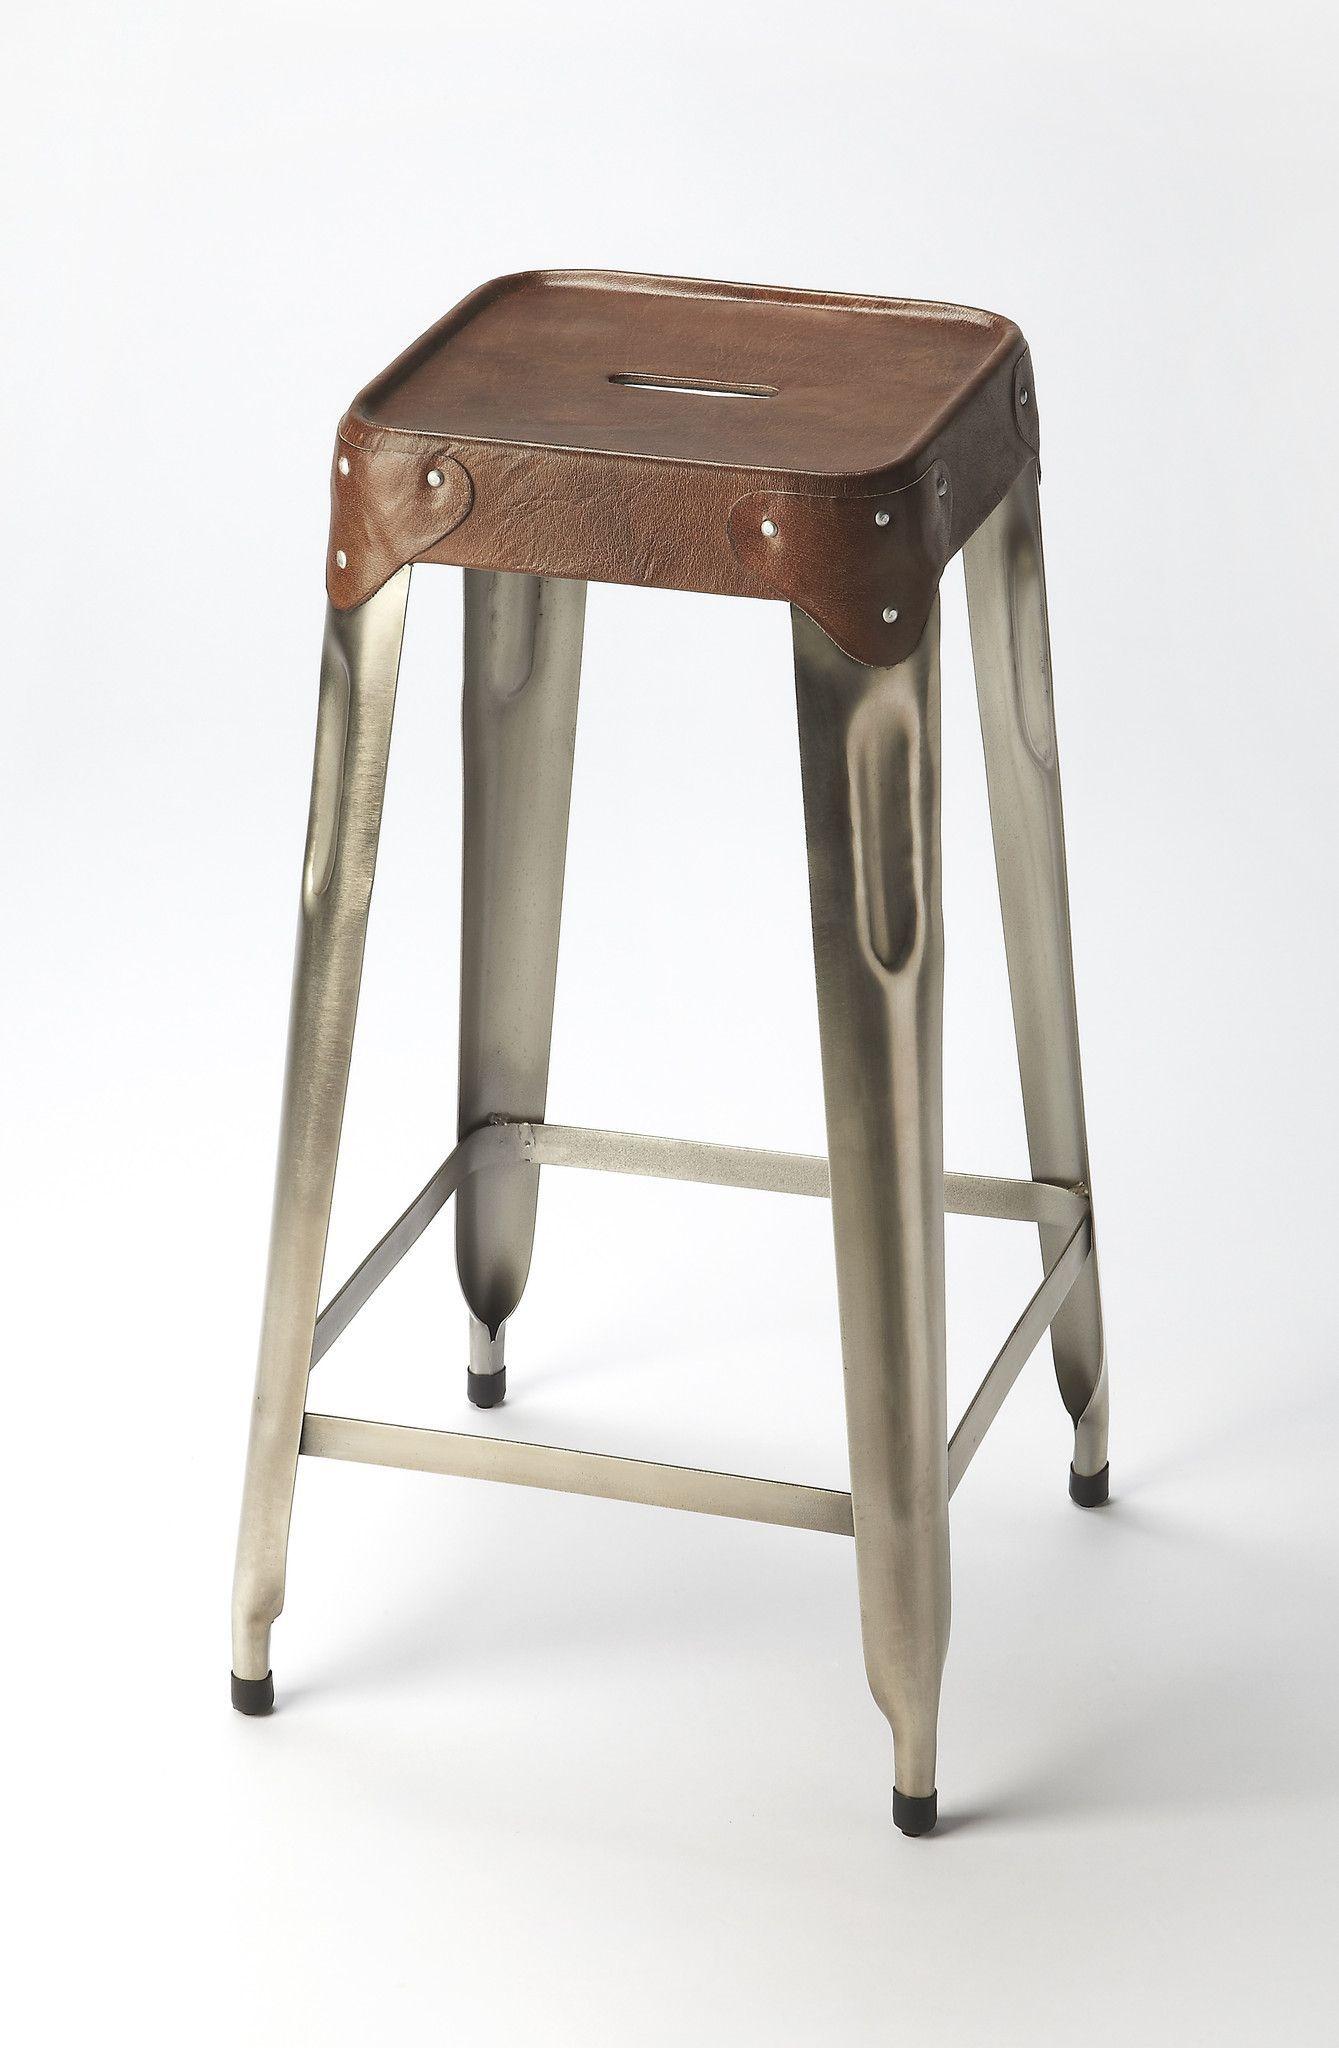 Buy Butler Furniture But 6134344 Connor Industrial Modern Barstool Medium Brown Modern Bar Stools Bar Stools Futuristic Furniture